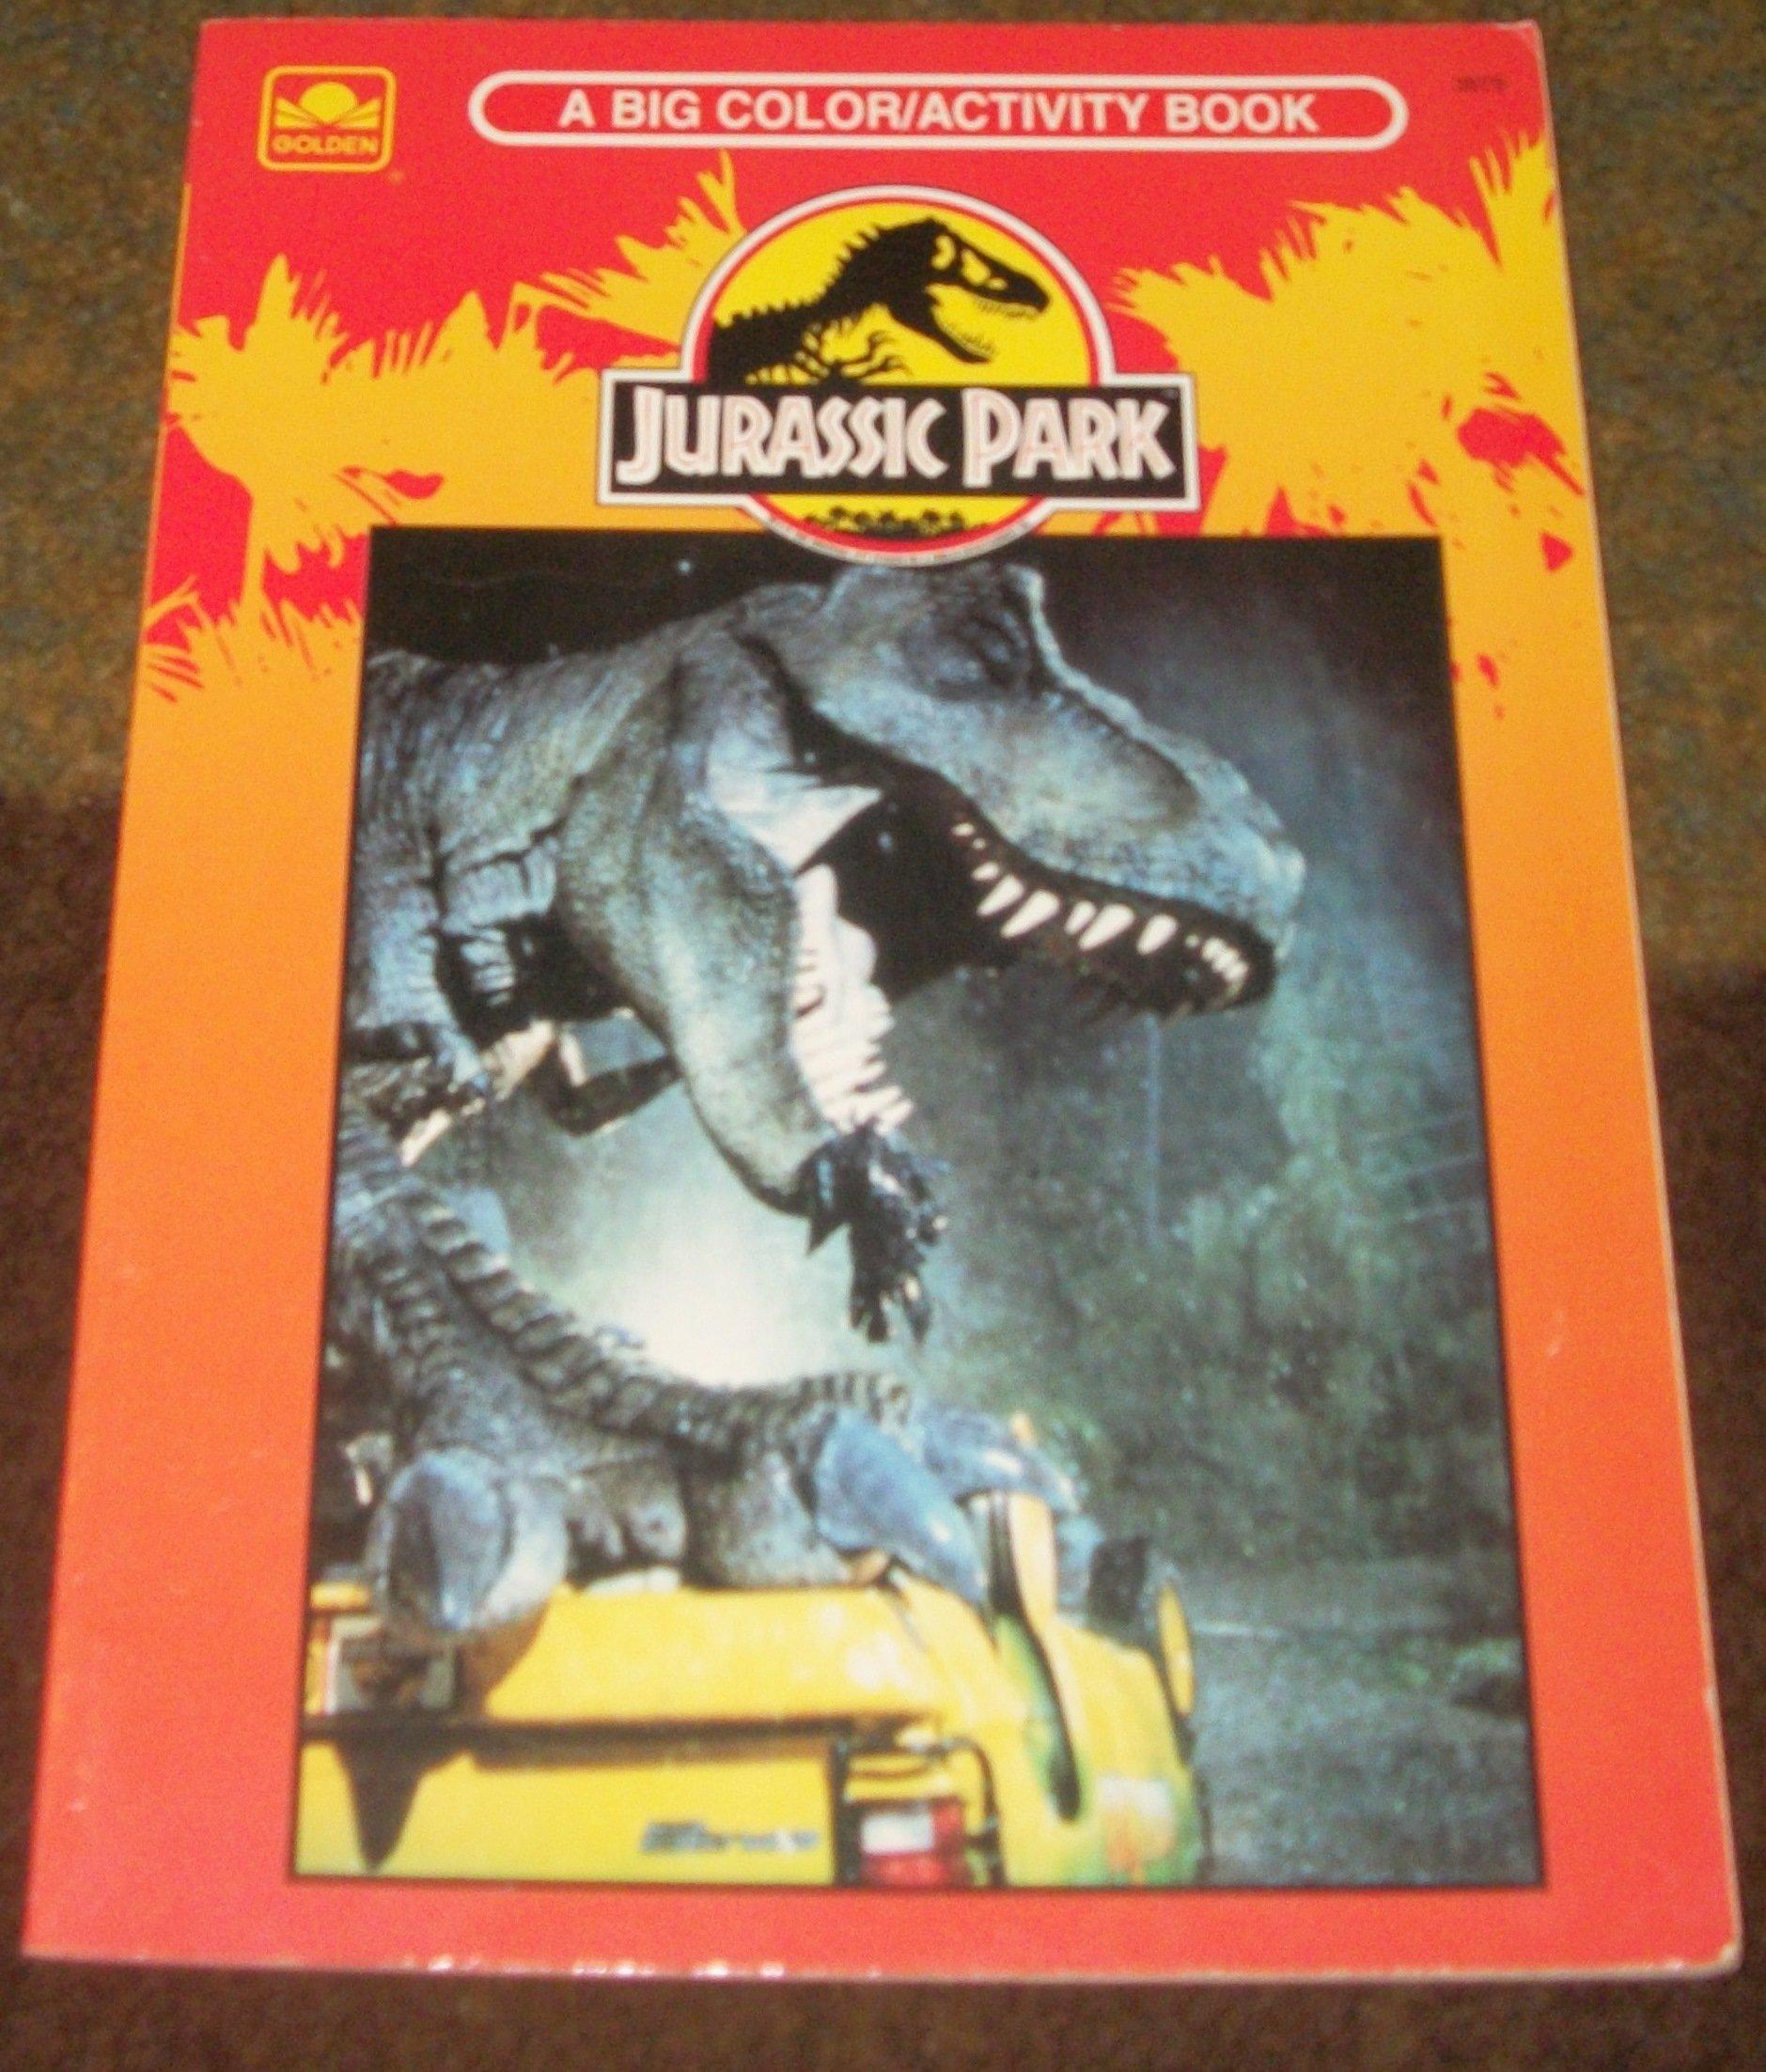 Jurassic Park A Big Color Activity Book Jurassic Park Wiki